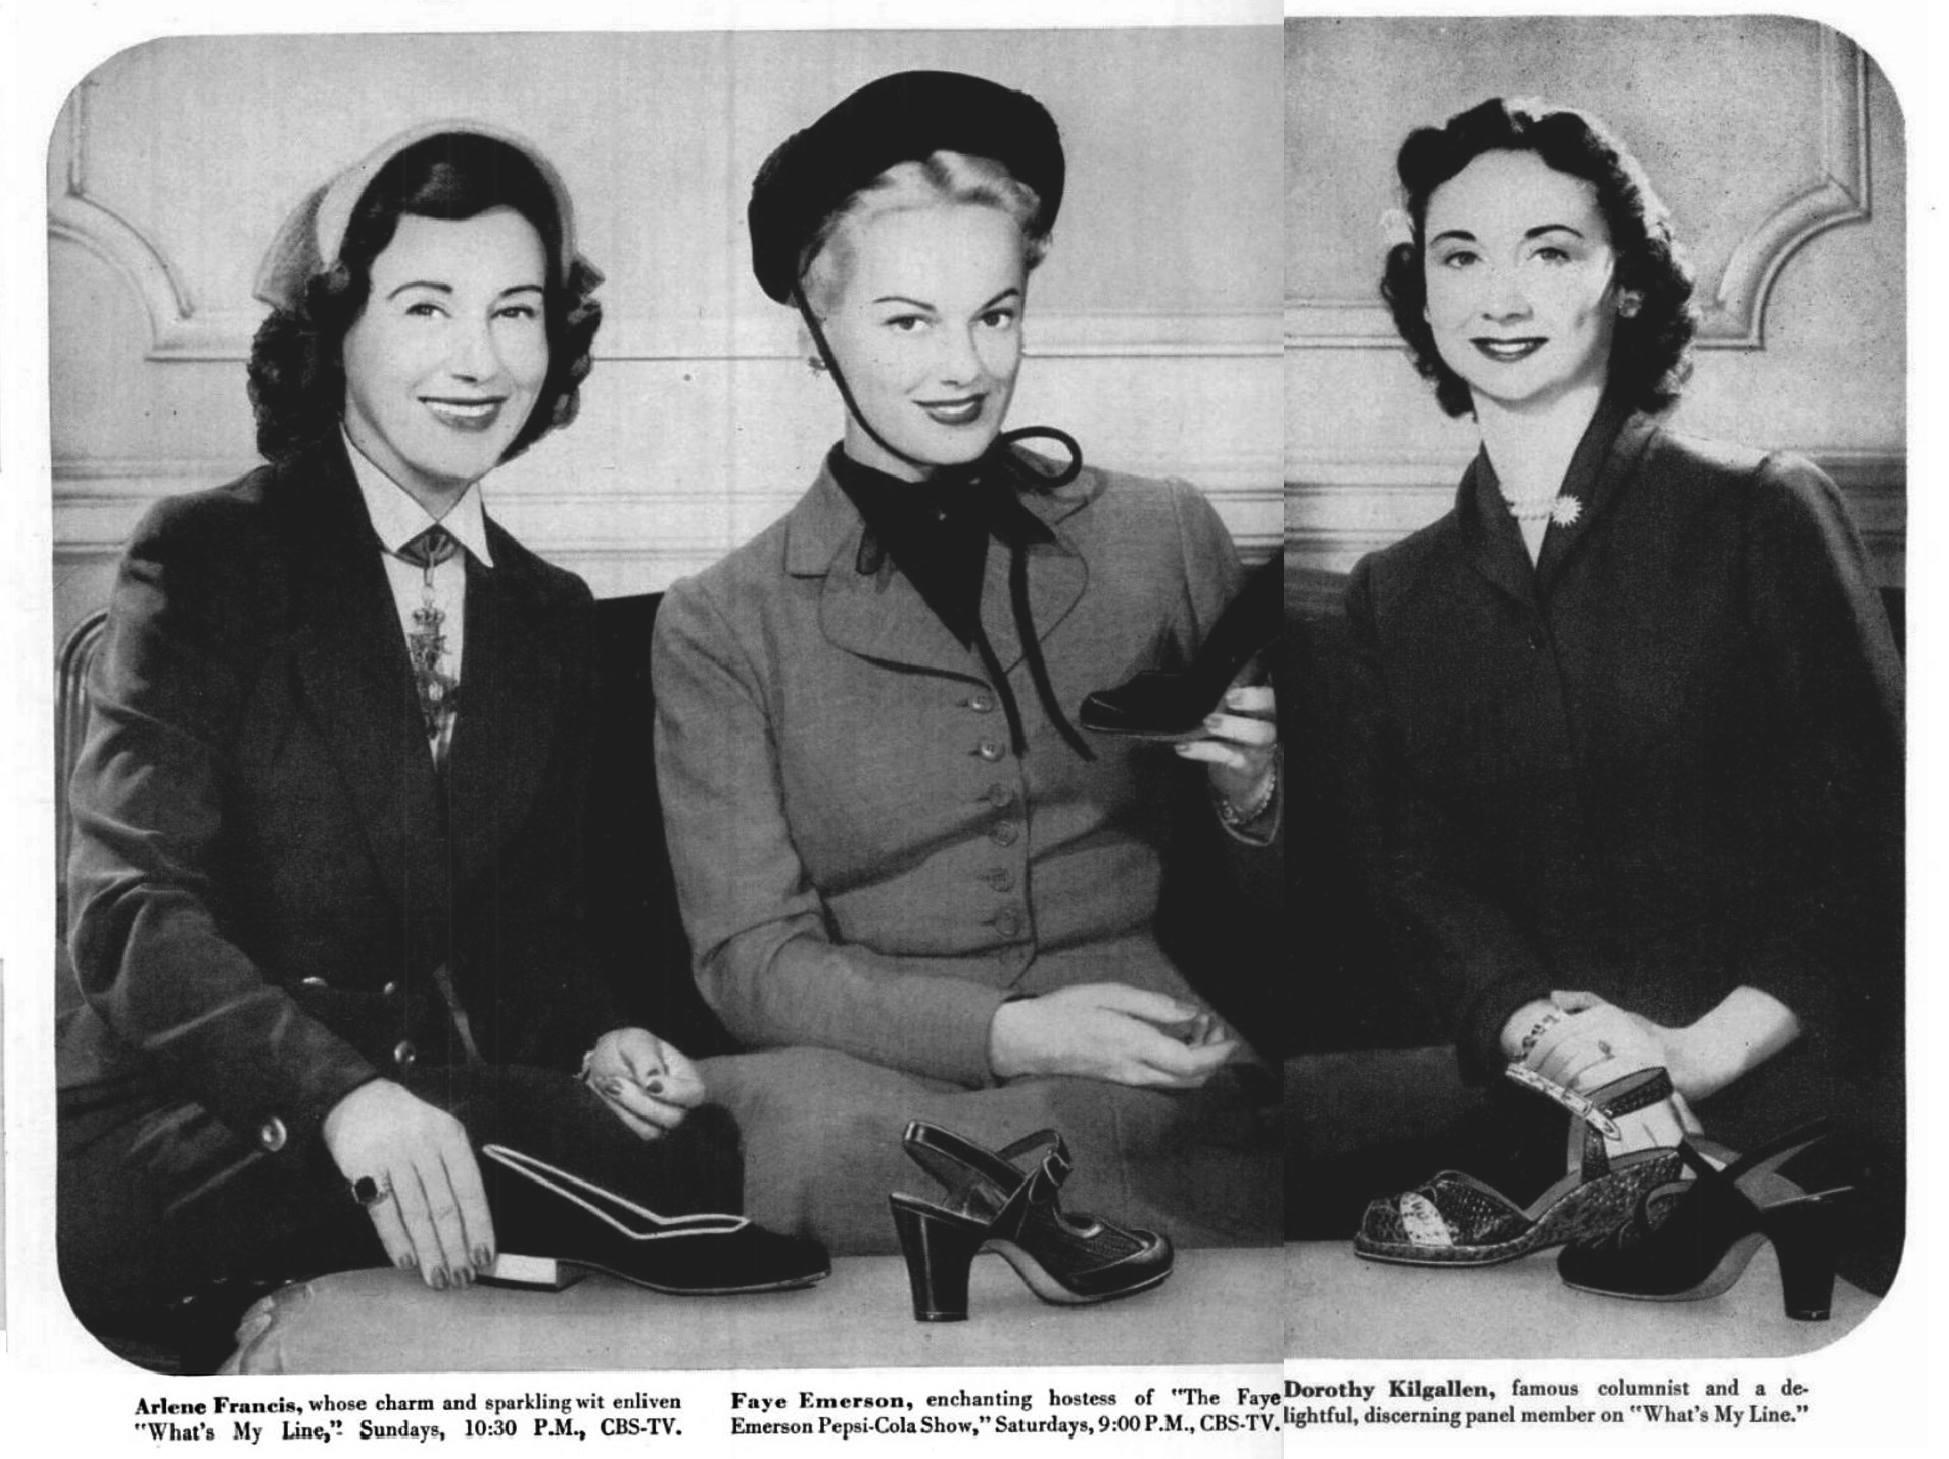 Arlene, Faye Emerson and Dorothy Kilgallen